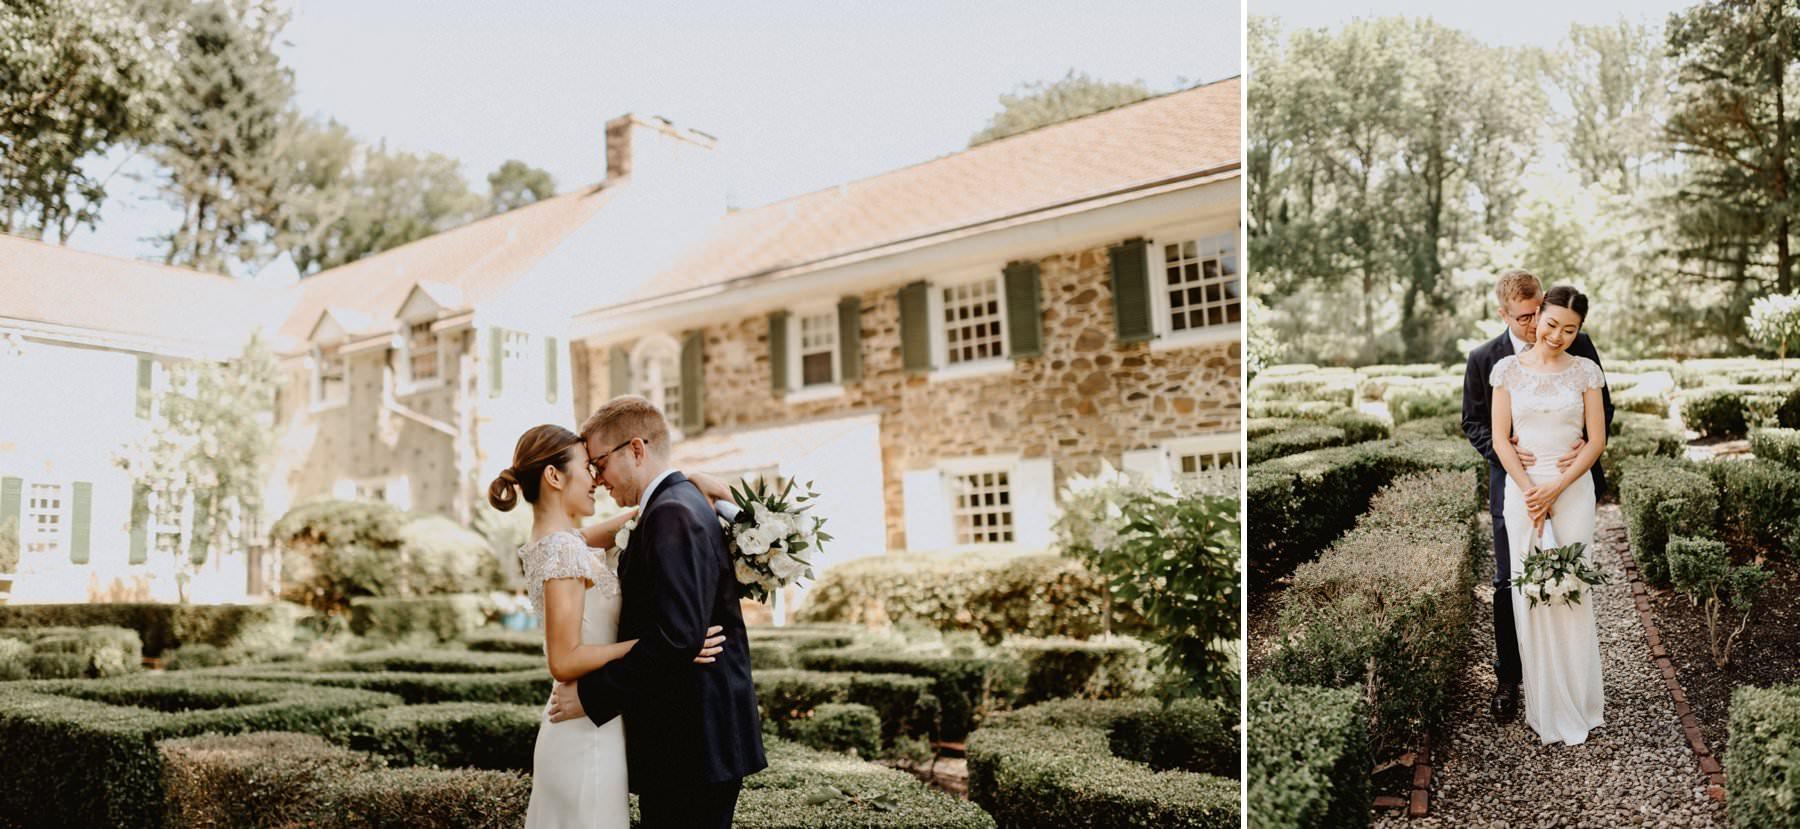 Appleford-estate-wedding-59.jpg